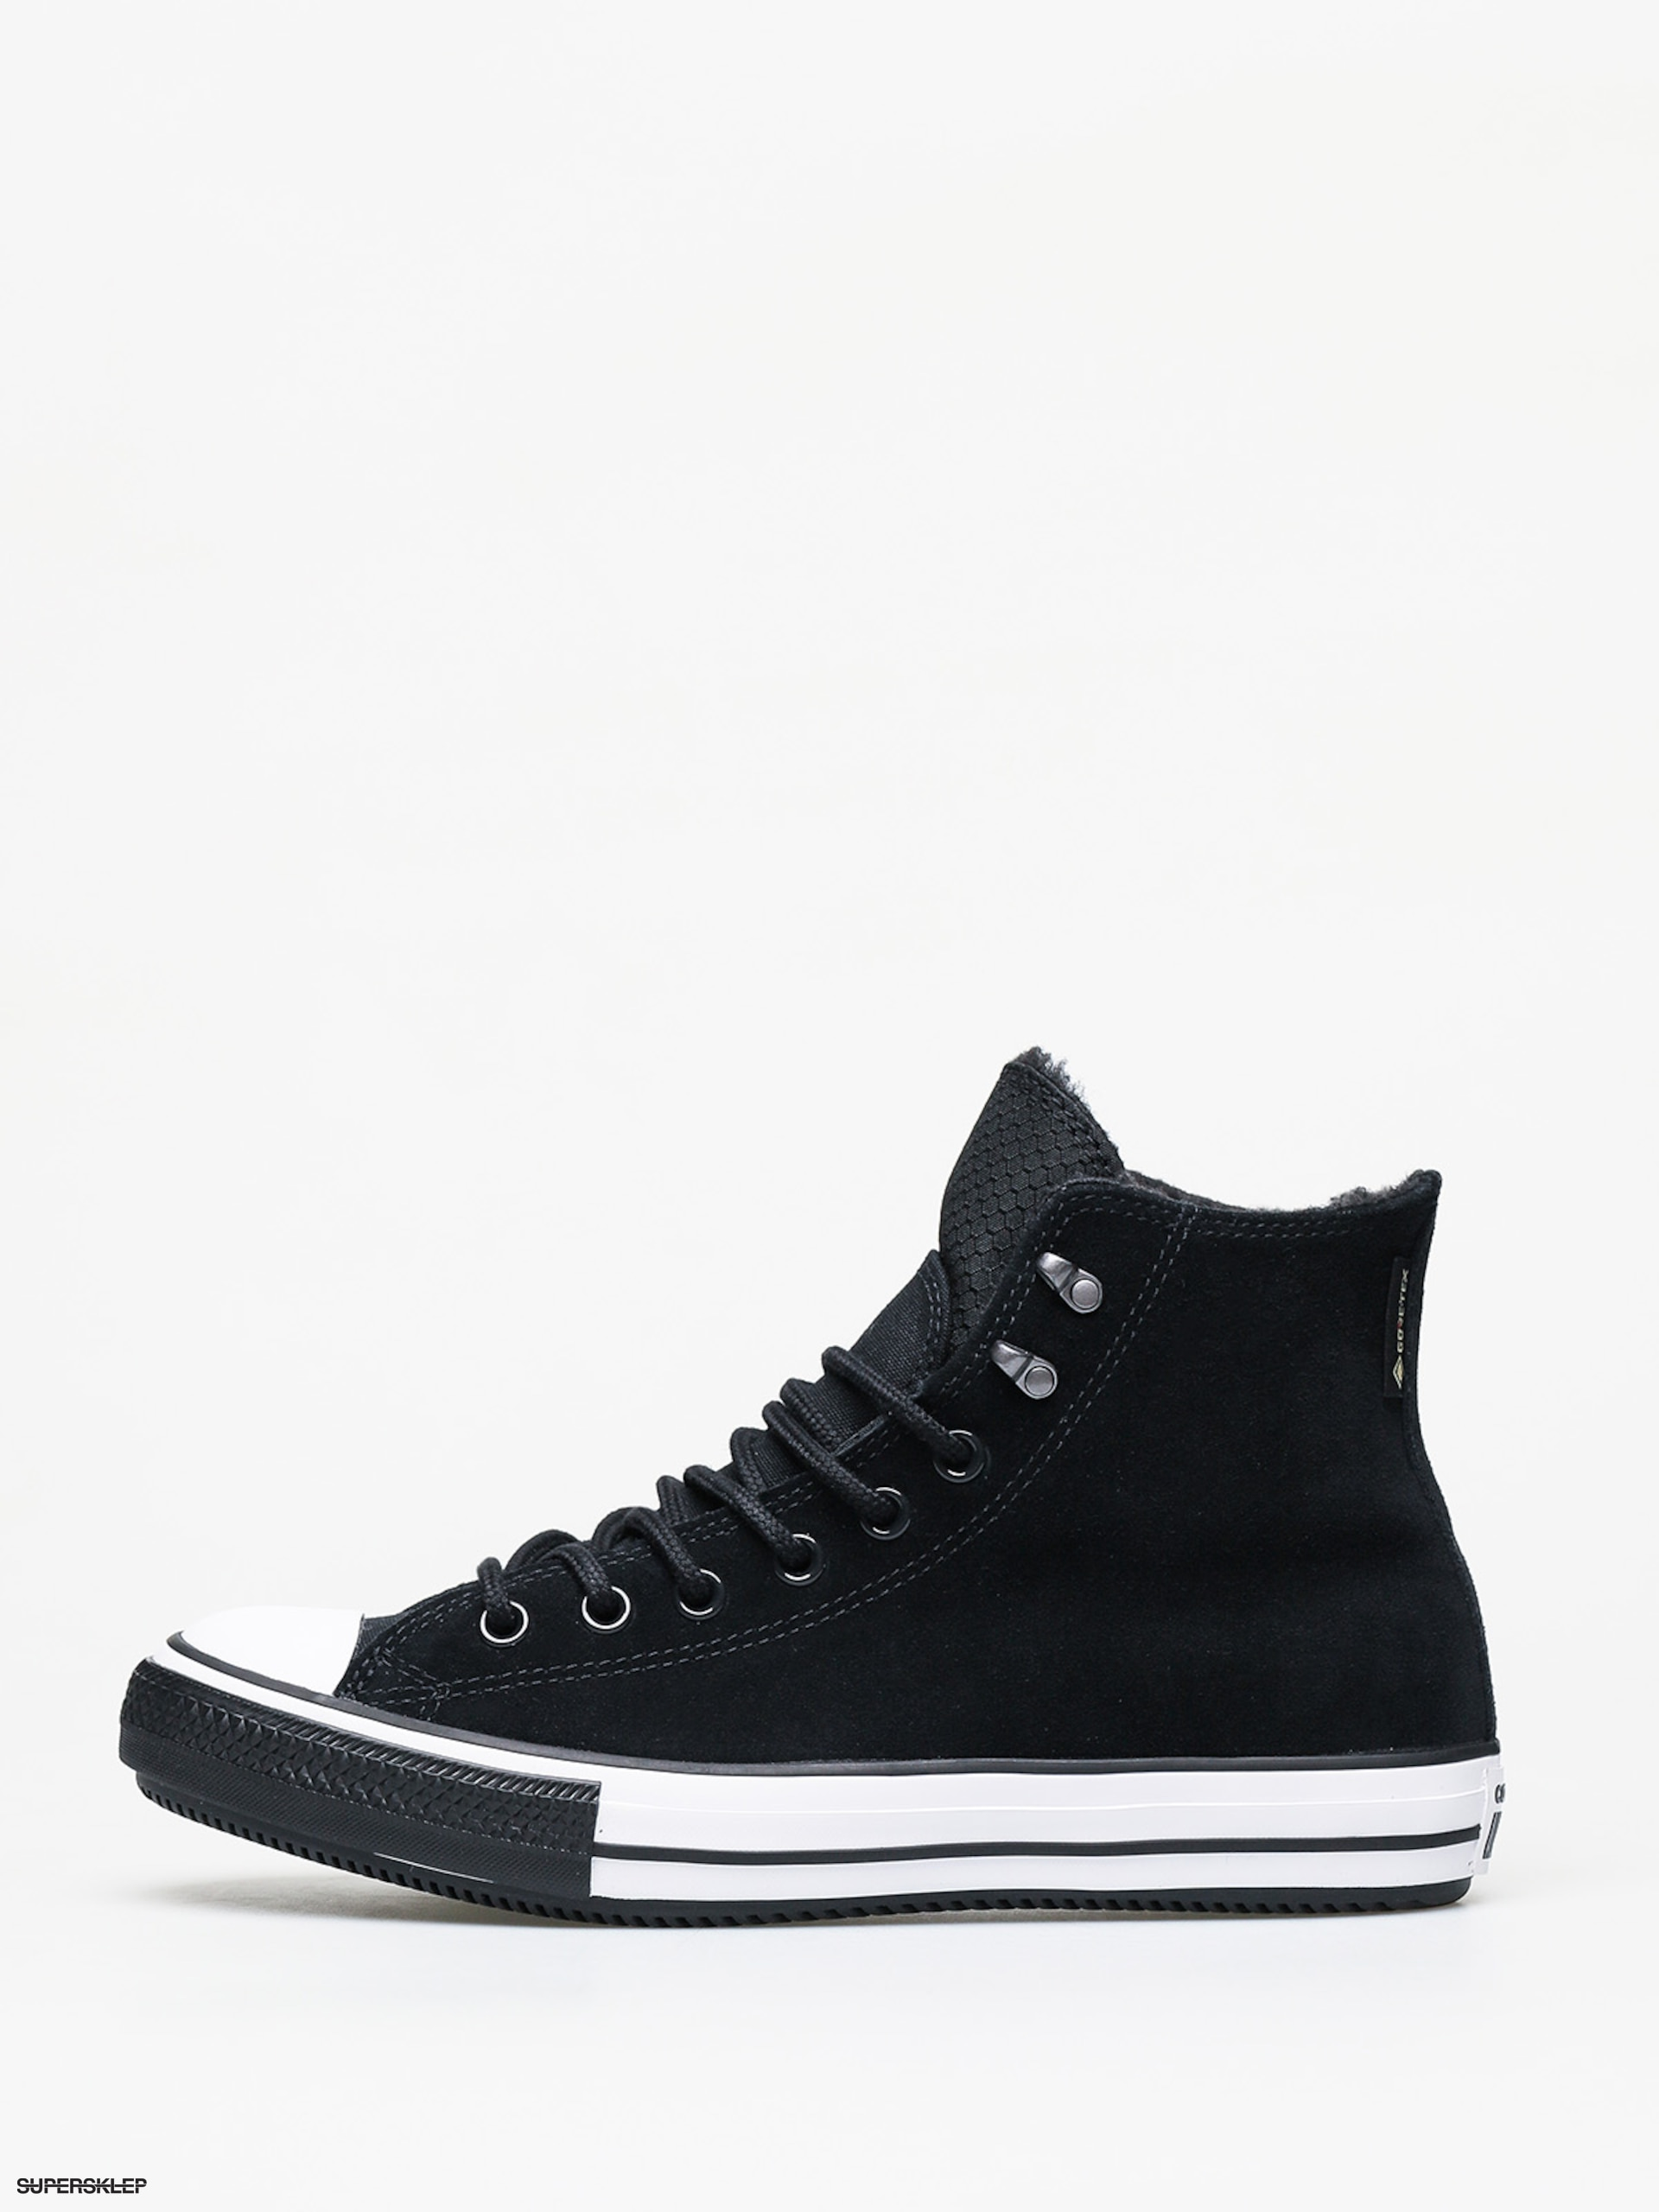 Converse Chuck Taylor All Star Hi Winter Leather Gore Tex